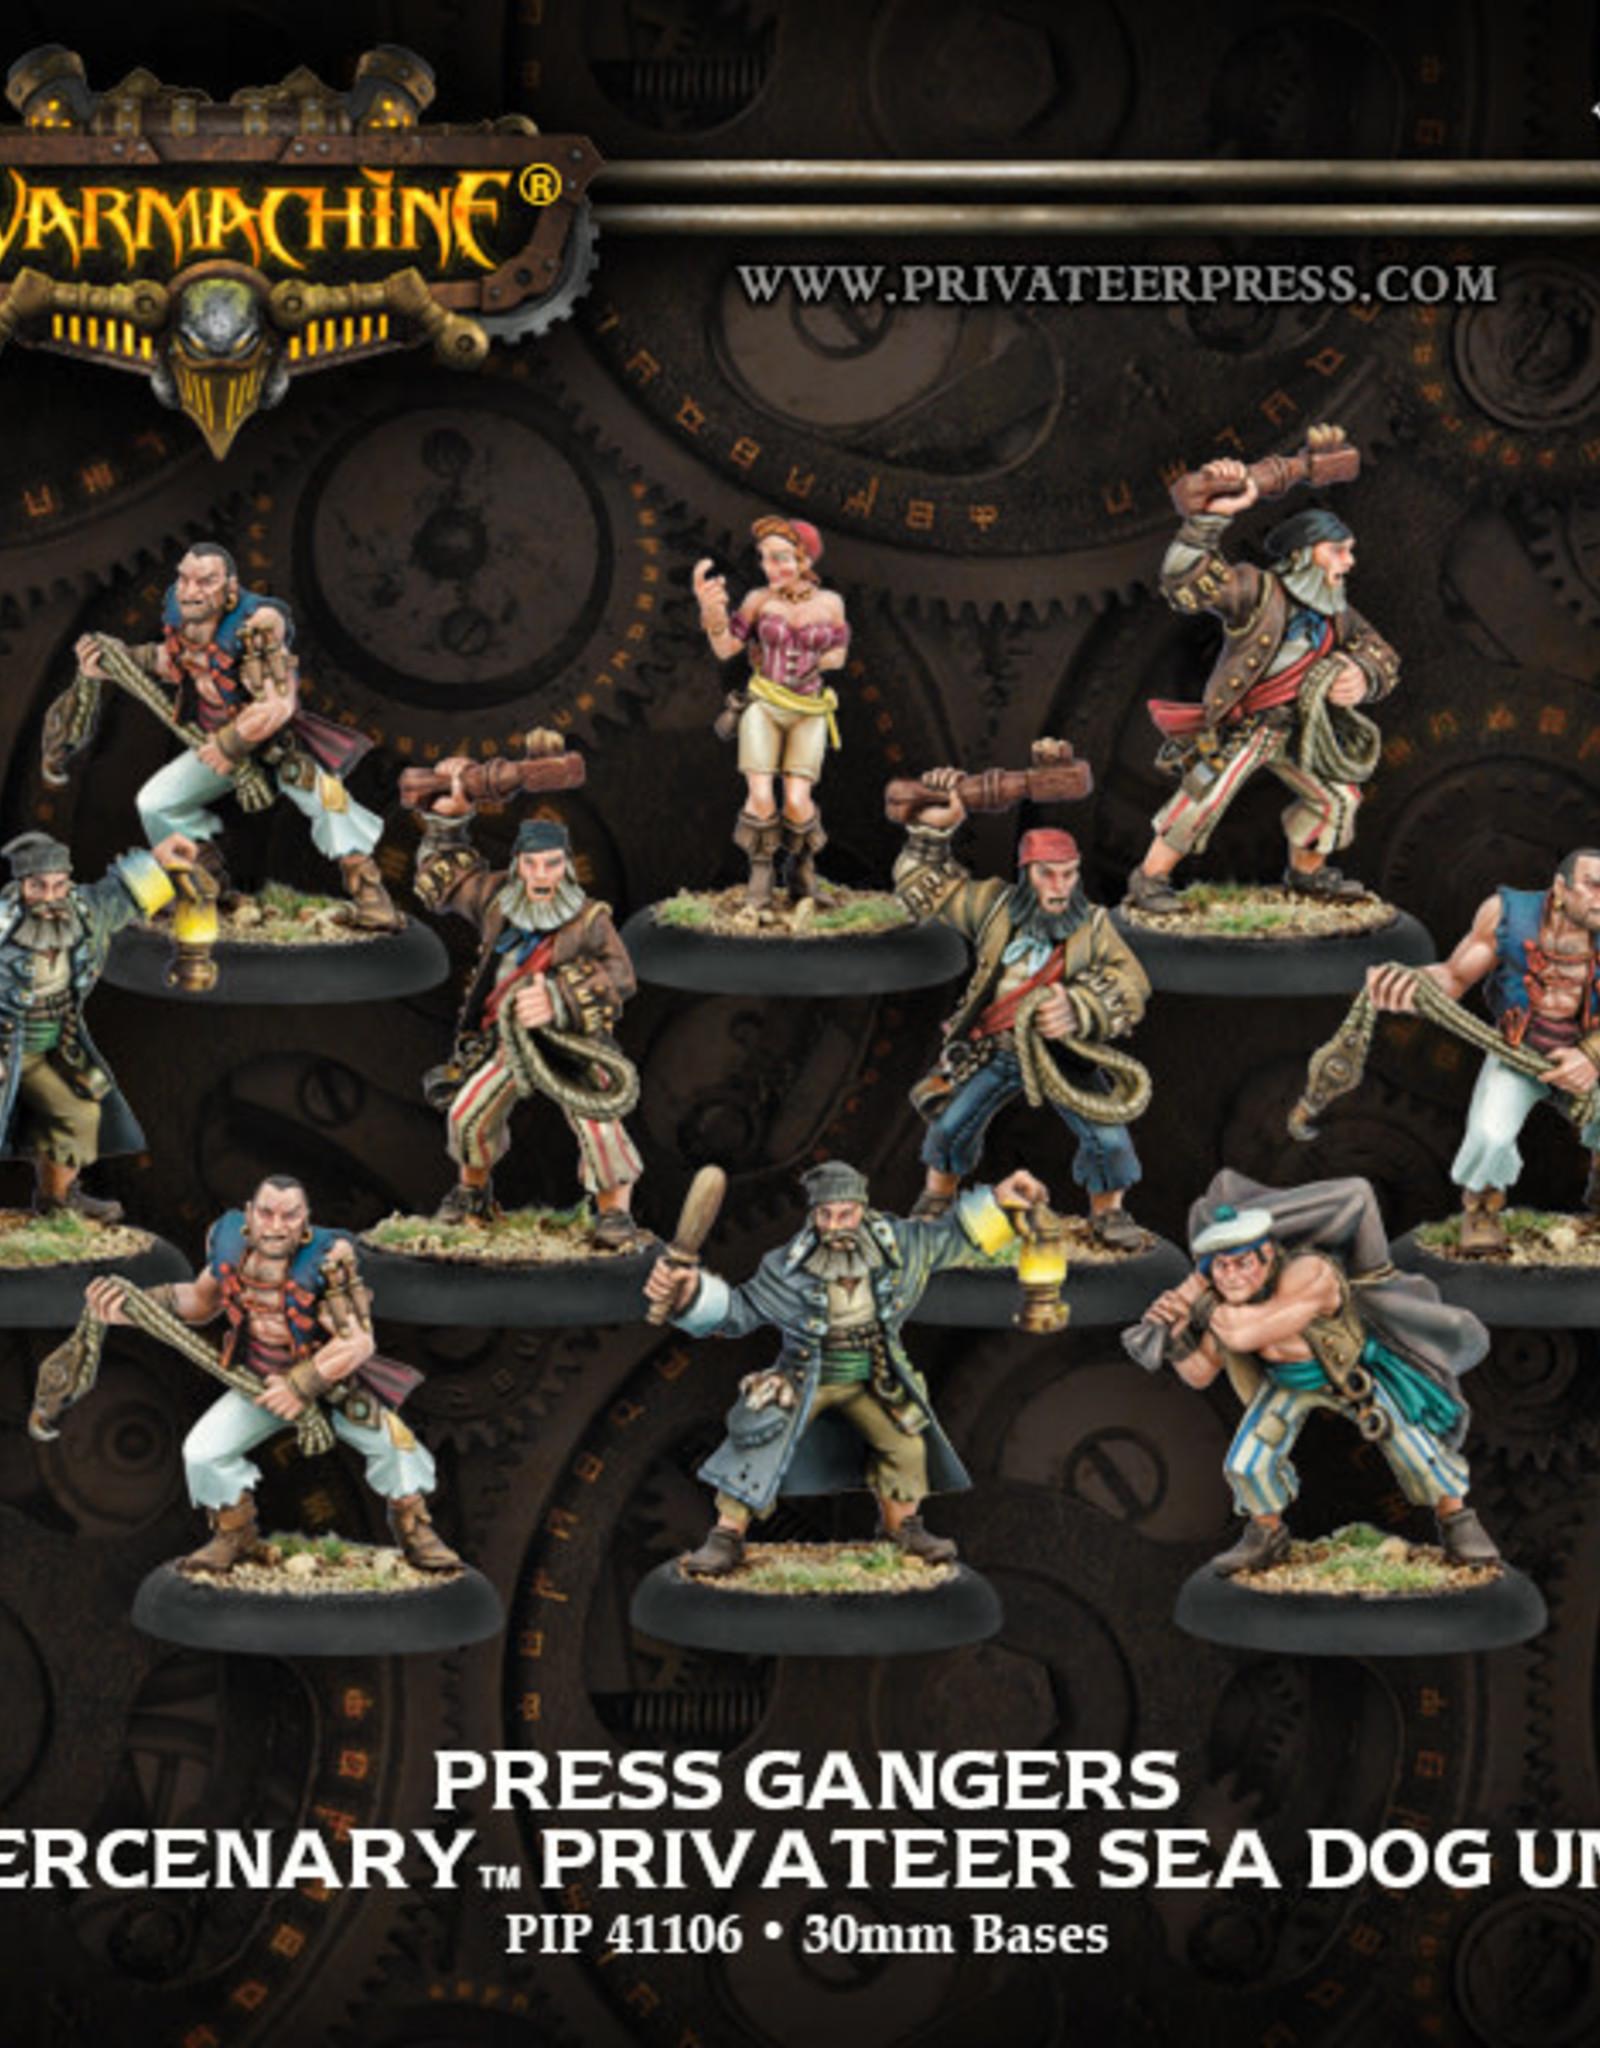 Warmachine Mercenaries - Press Gangers